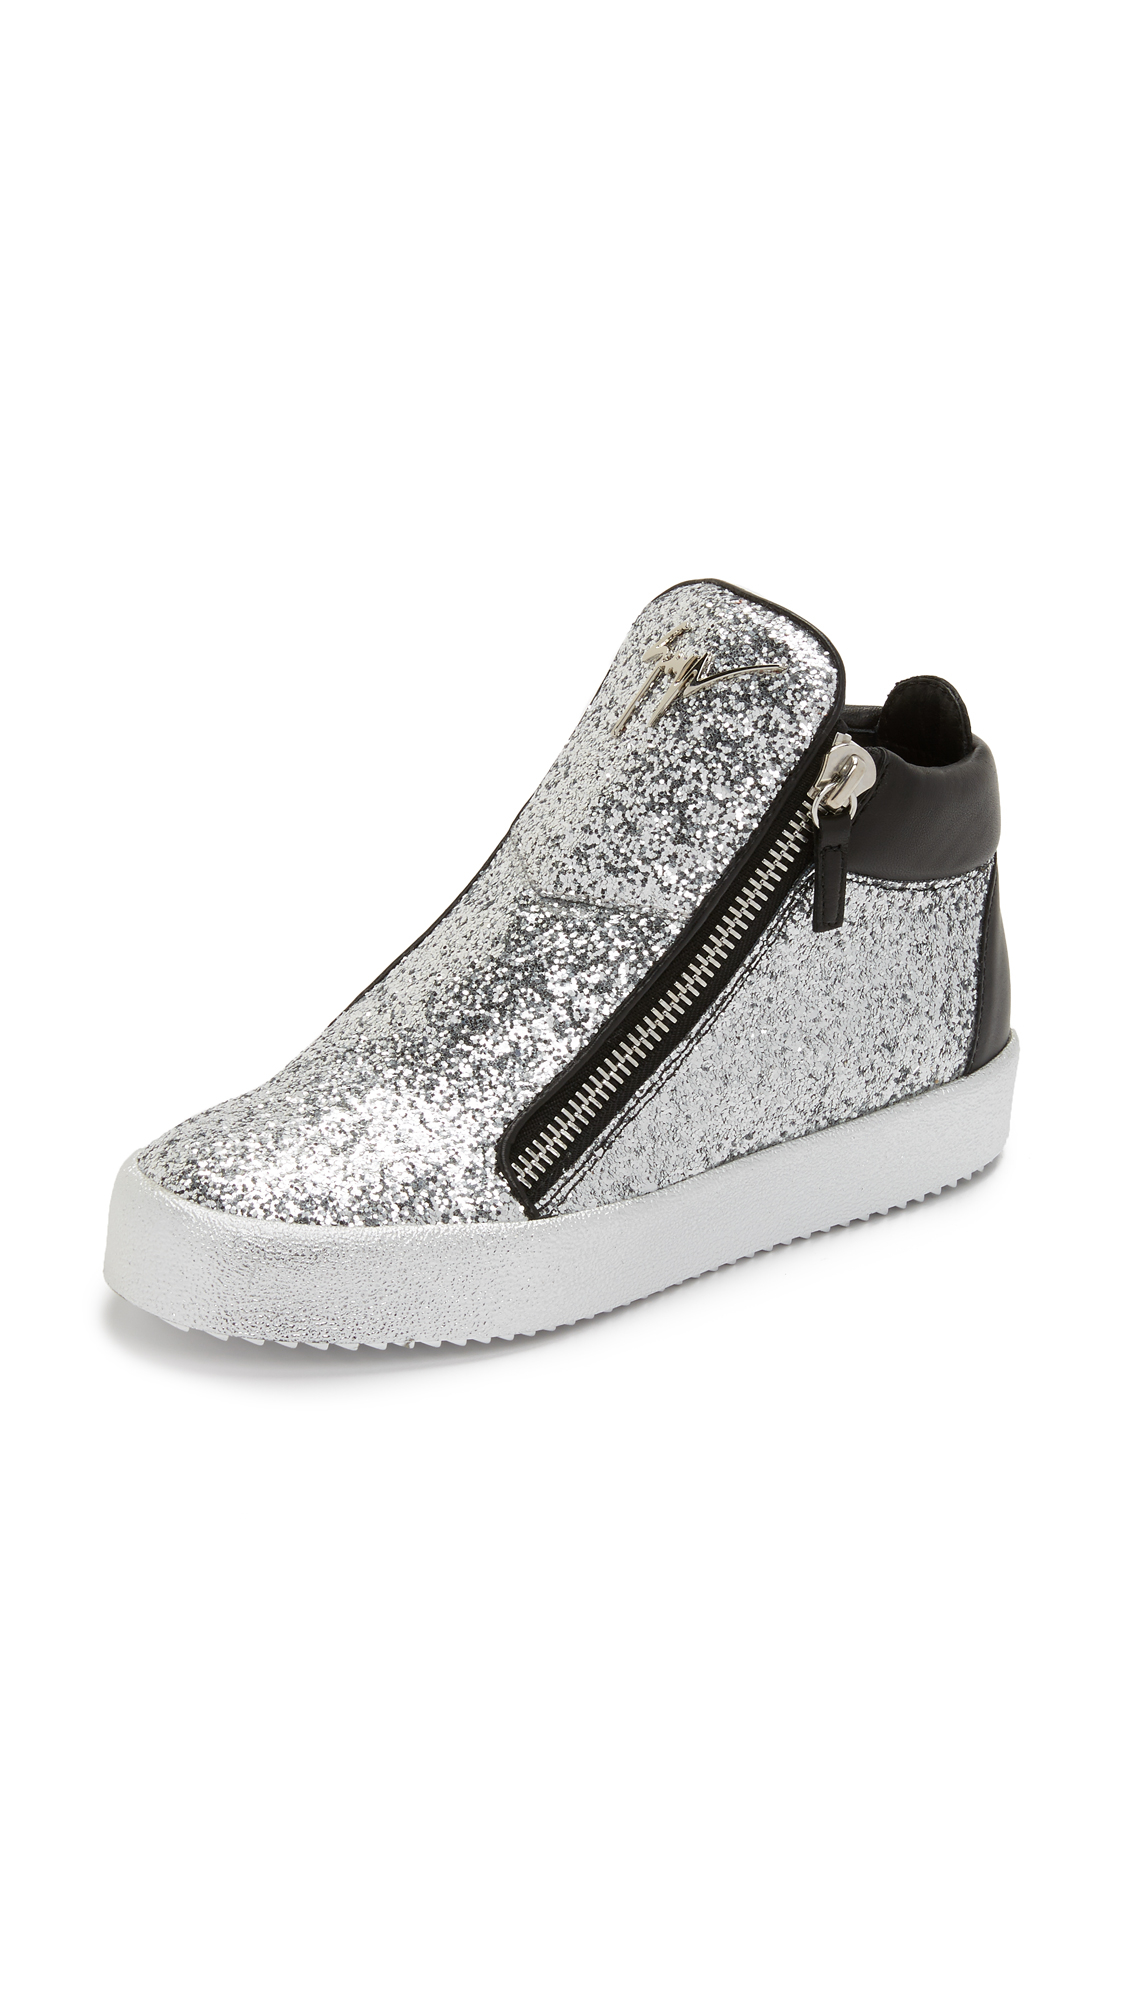 Giuseppe Zanotti Glitter Zip Sneakers (Women's) lGoCcGMDGm